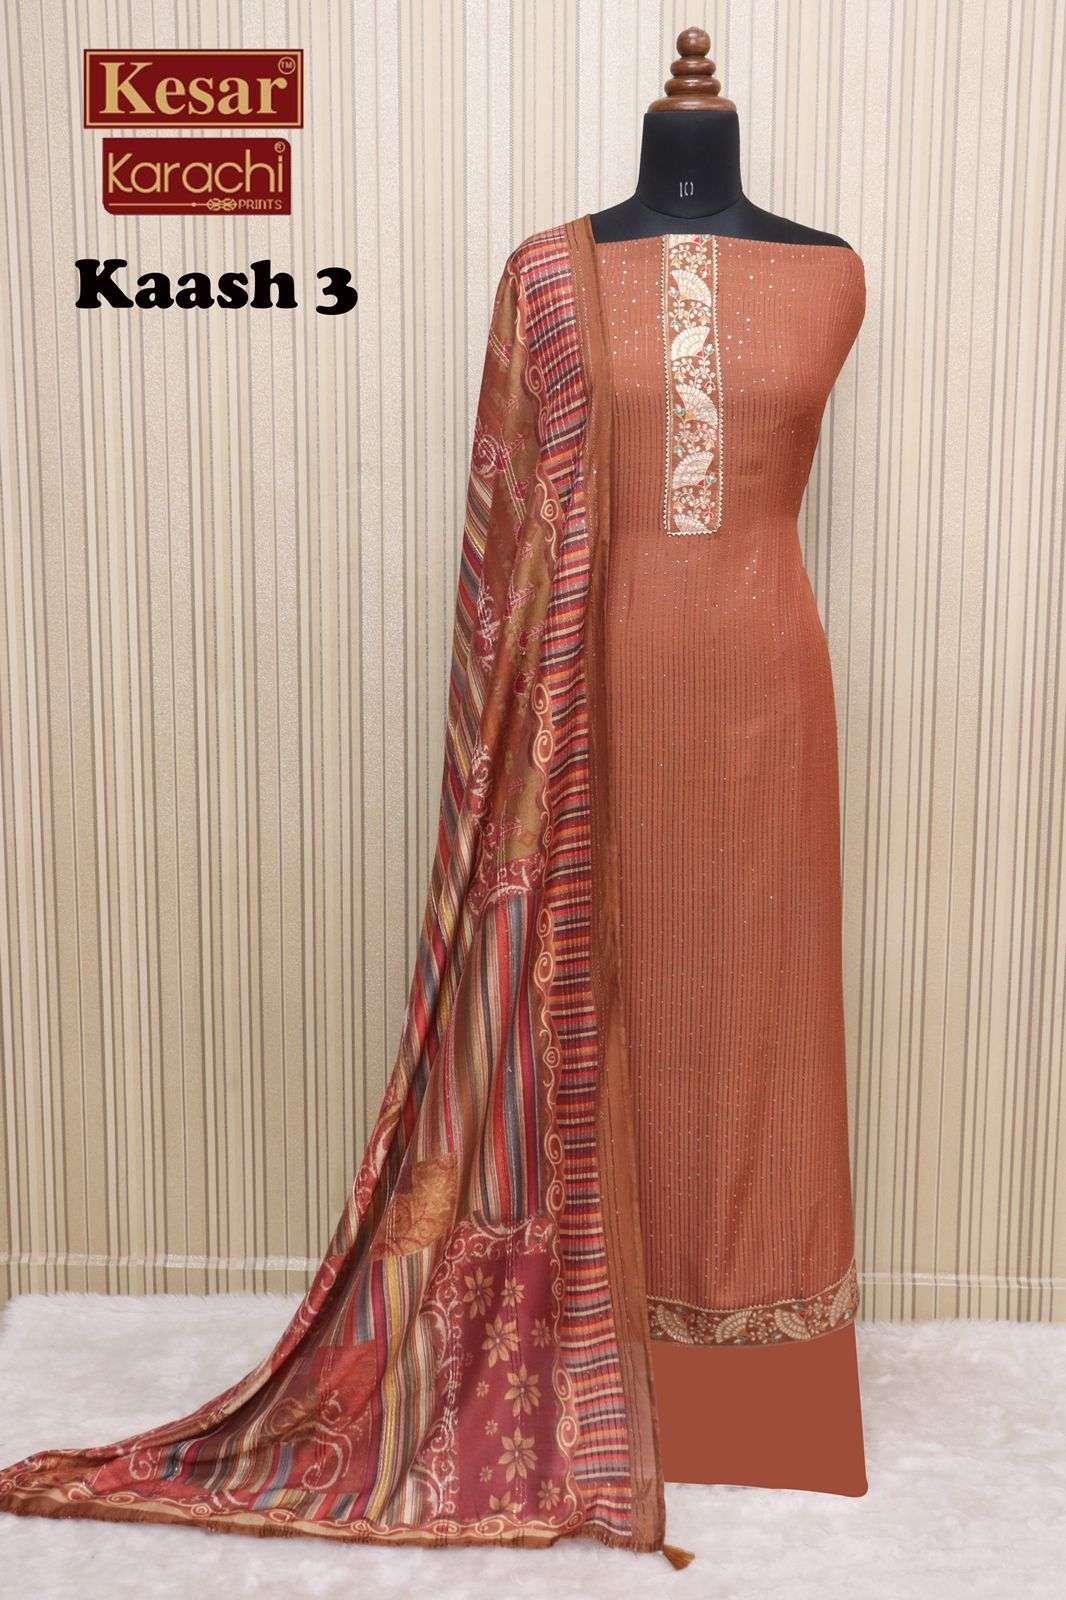 Kesar kaash Vol 3 By Karachi Print fancy Muslin Salwar kameez catalog Wholesaler